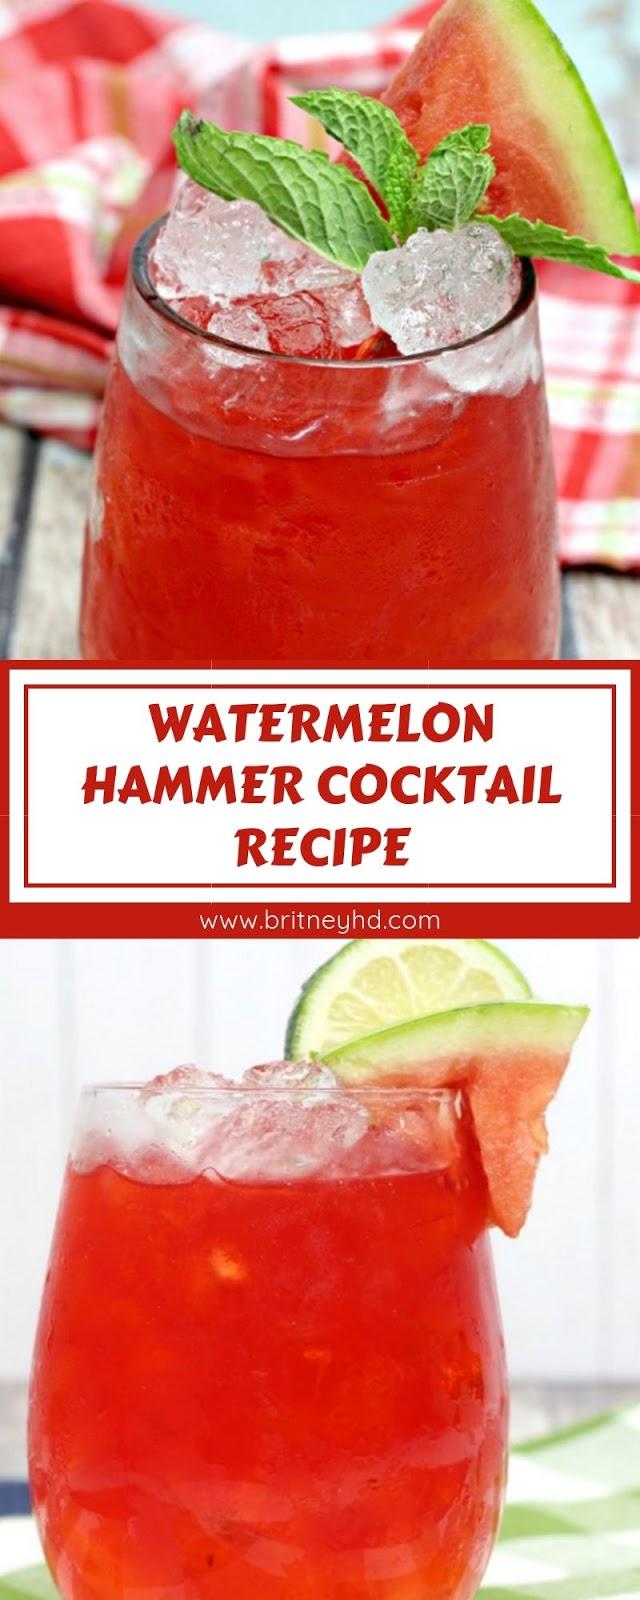 WATERMELON HAMMER COCKTAIL RECIPE